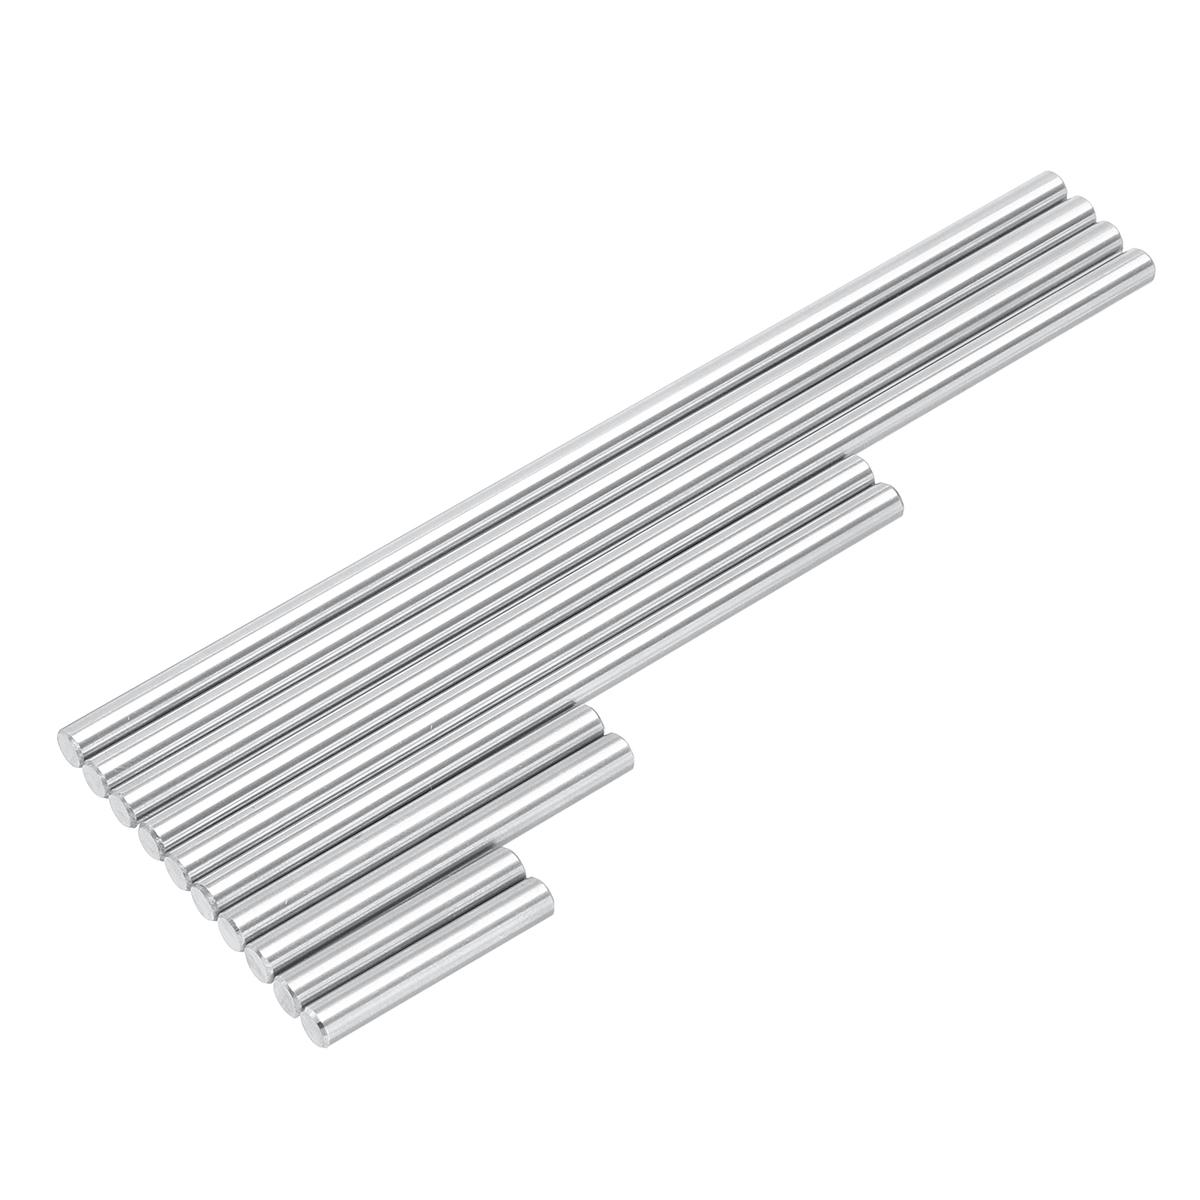 10pcs 5 2mm Ejector Pins Set 3 2 15 2cm Push Rifling